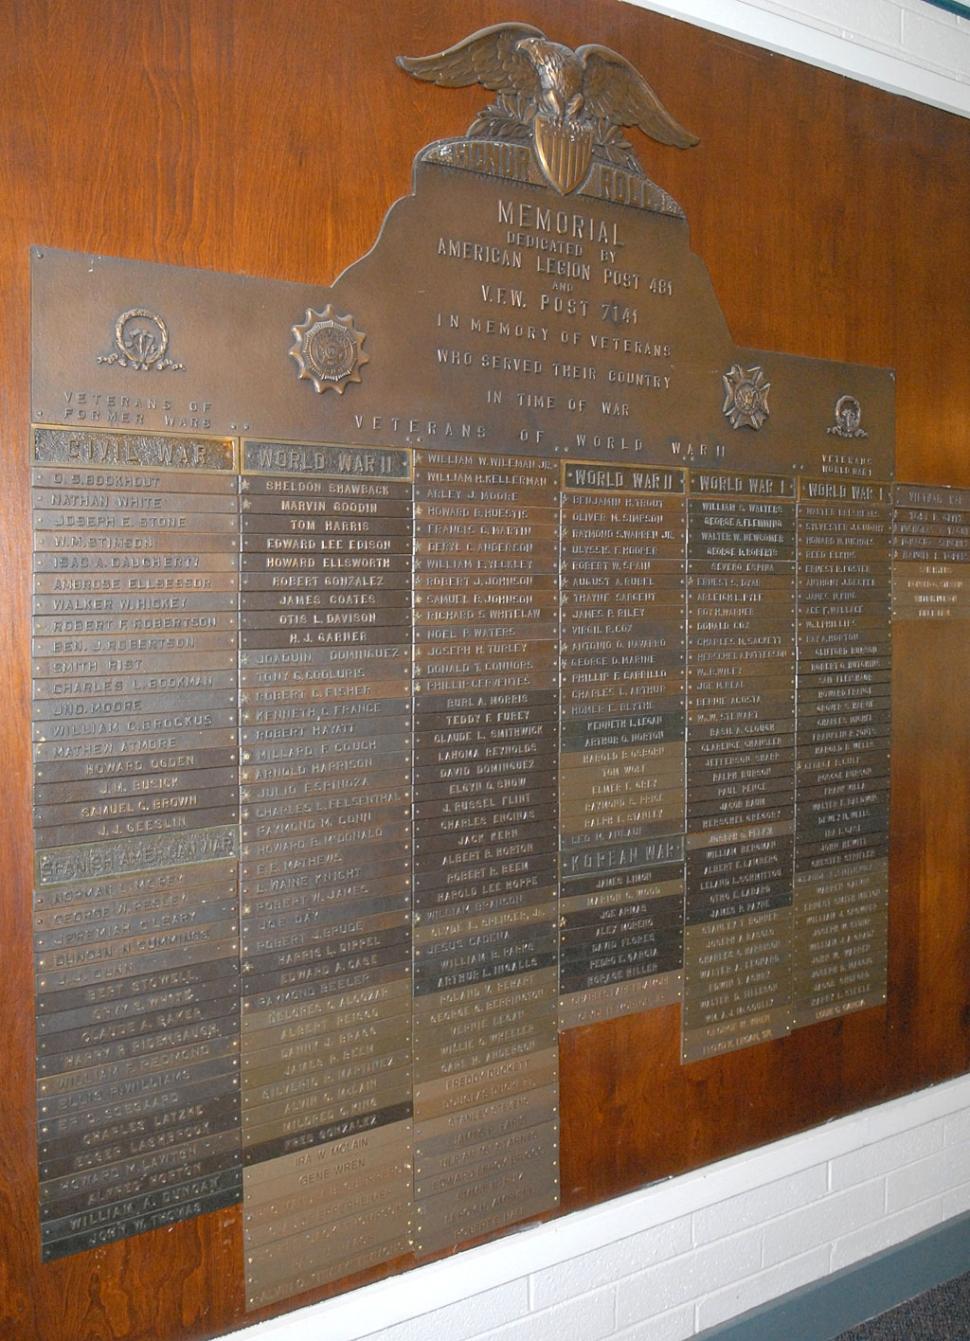 Veterans Memorial Wall Ceremony | The Fillmore Gazette